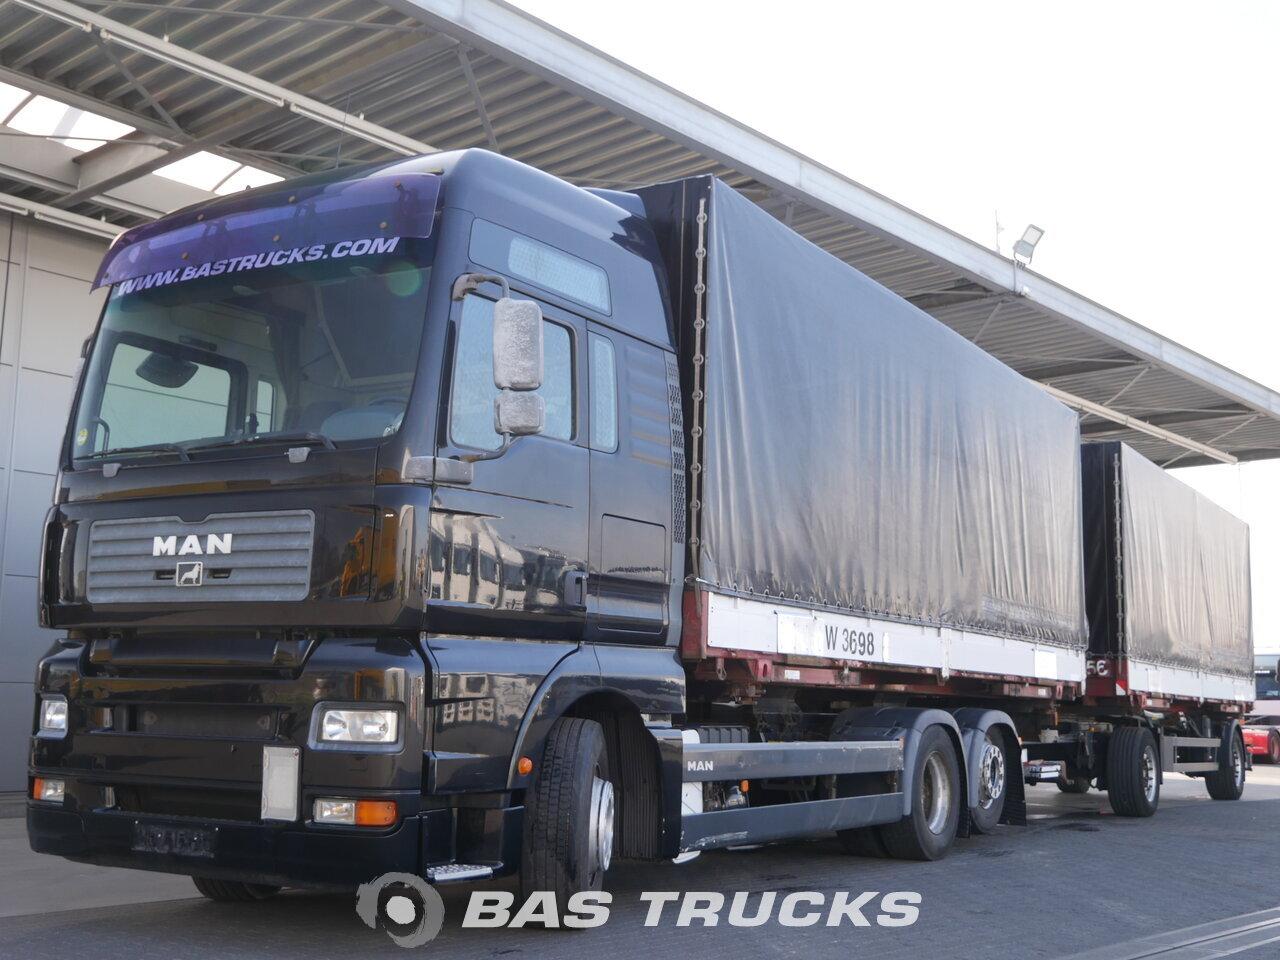 Рада приняла закон о штрафах за перегруженные грузовики - Цензор.НЕТ 184